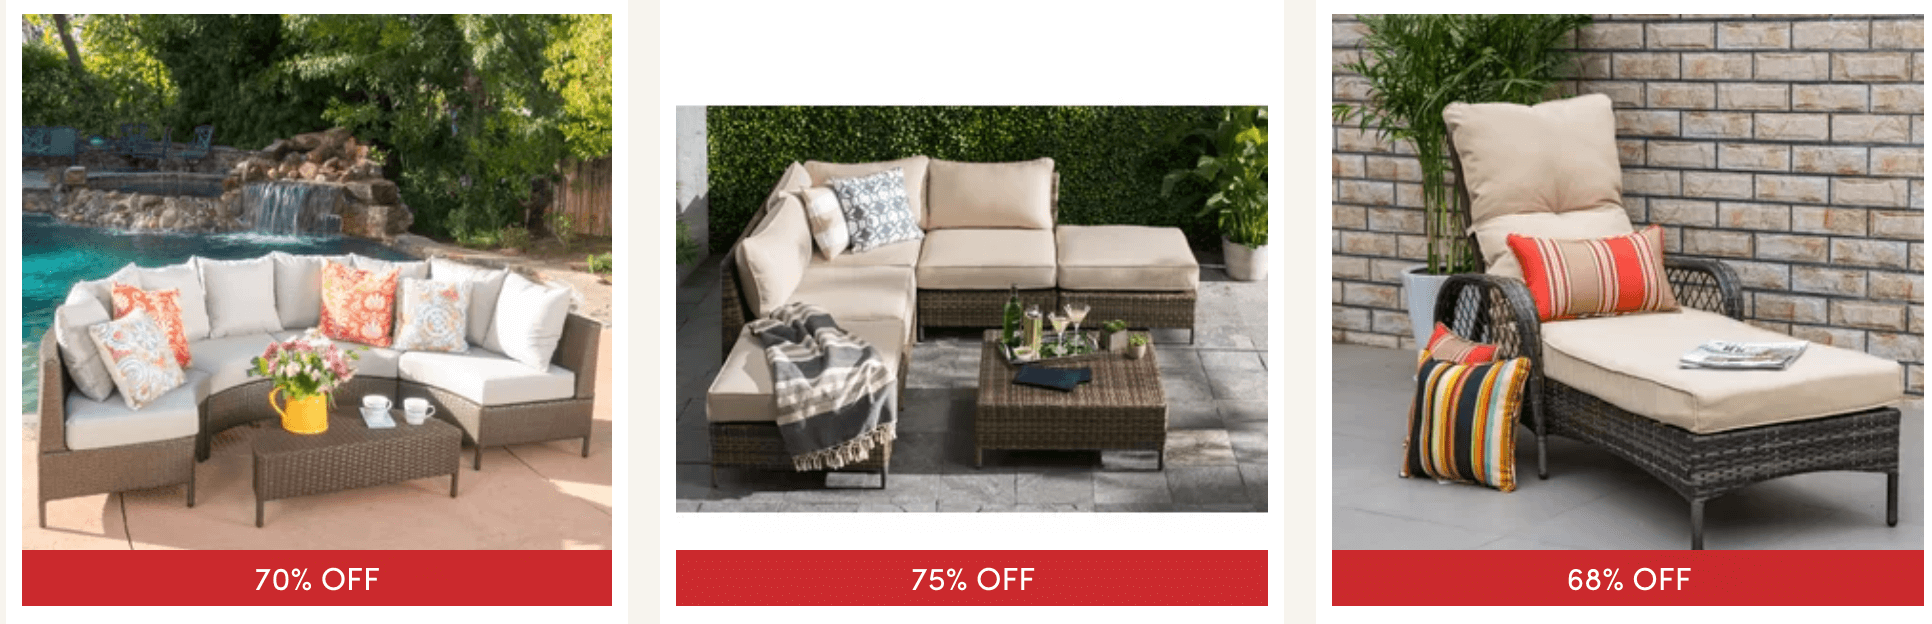 black friday outdoor furniture deals